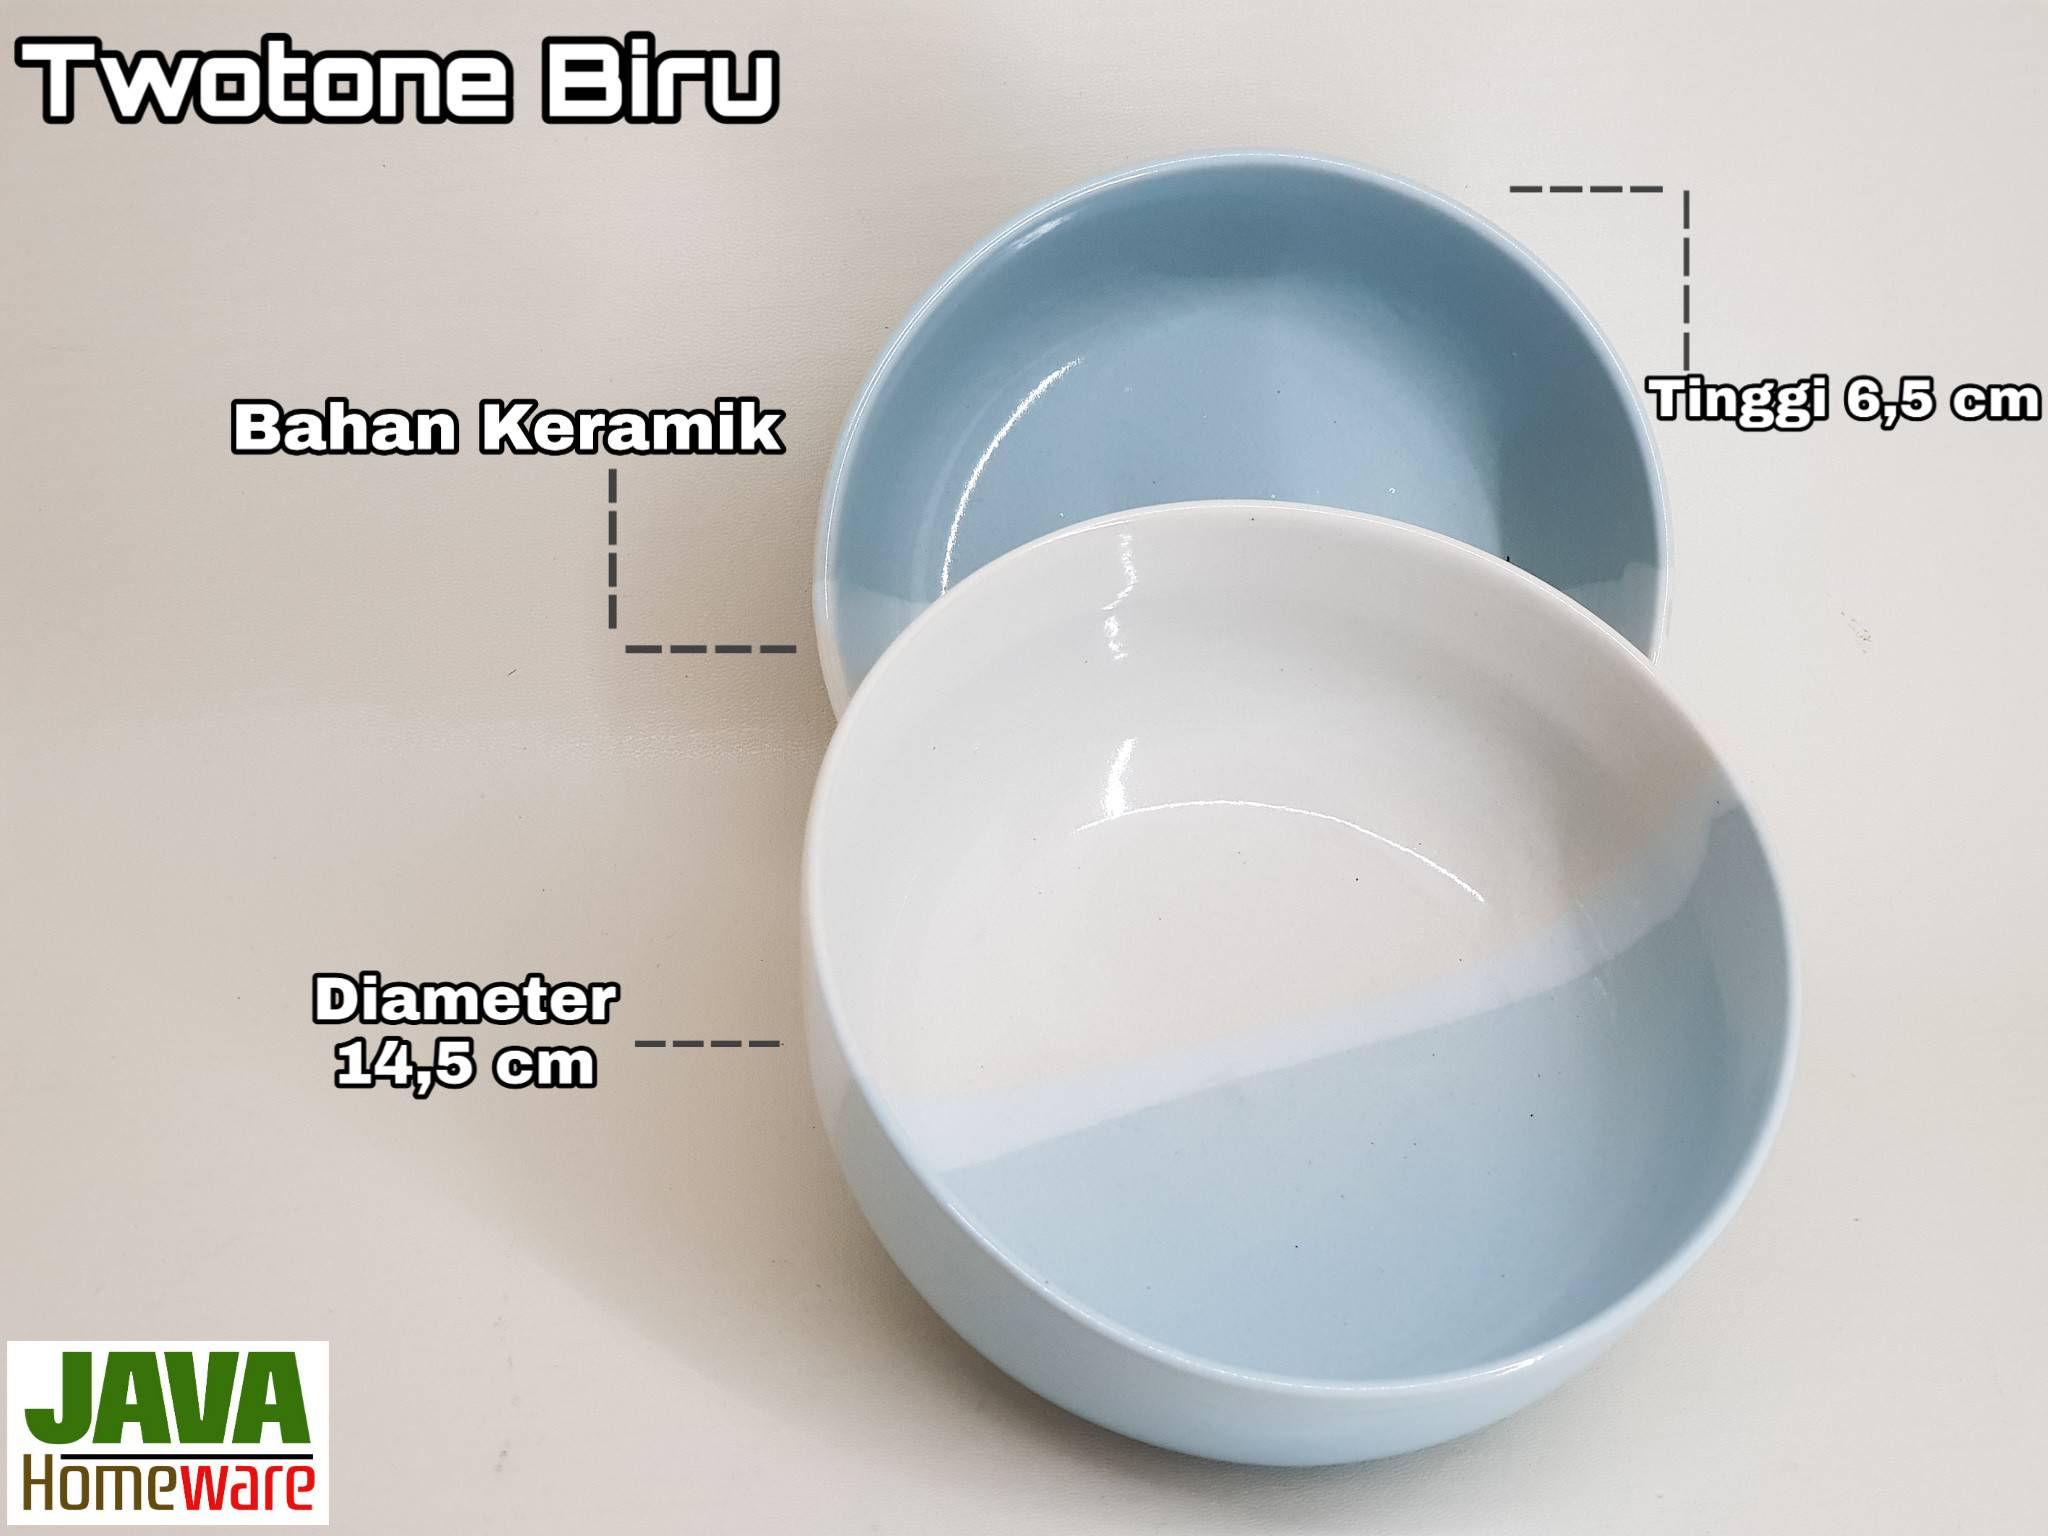 Mangkok twotone biru